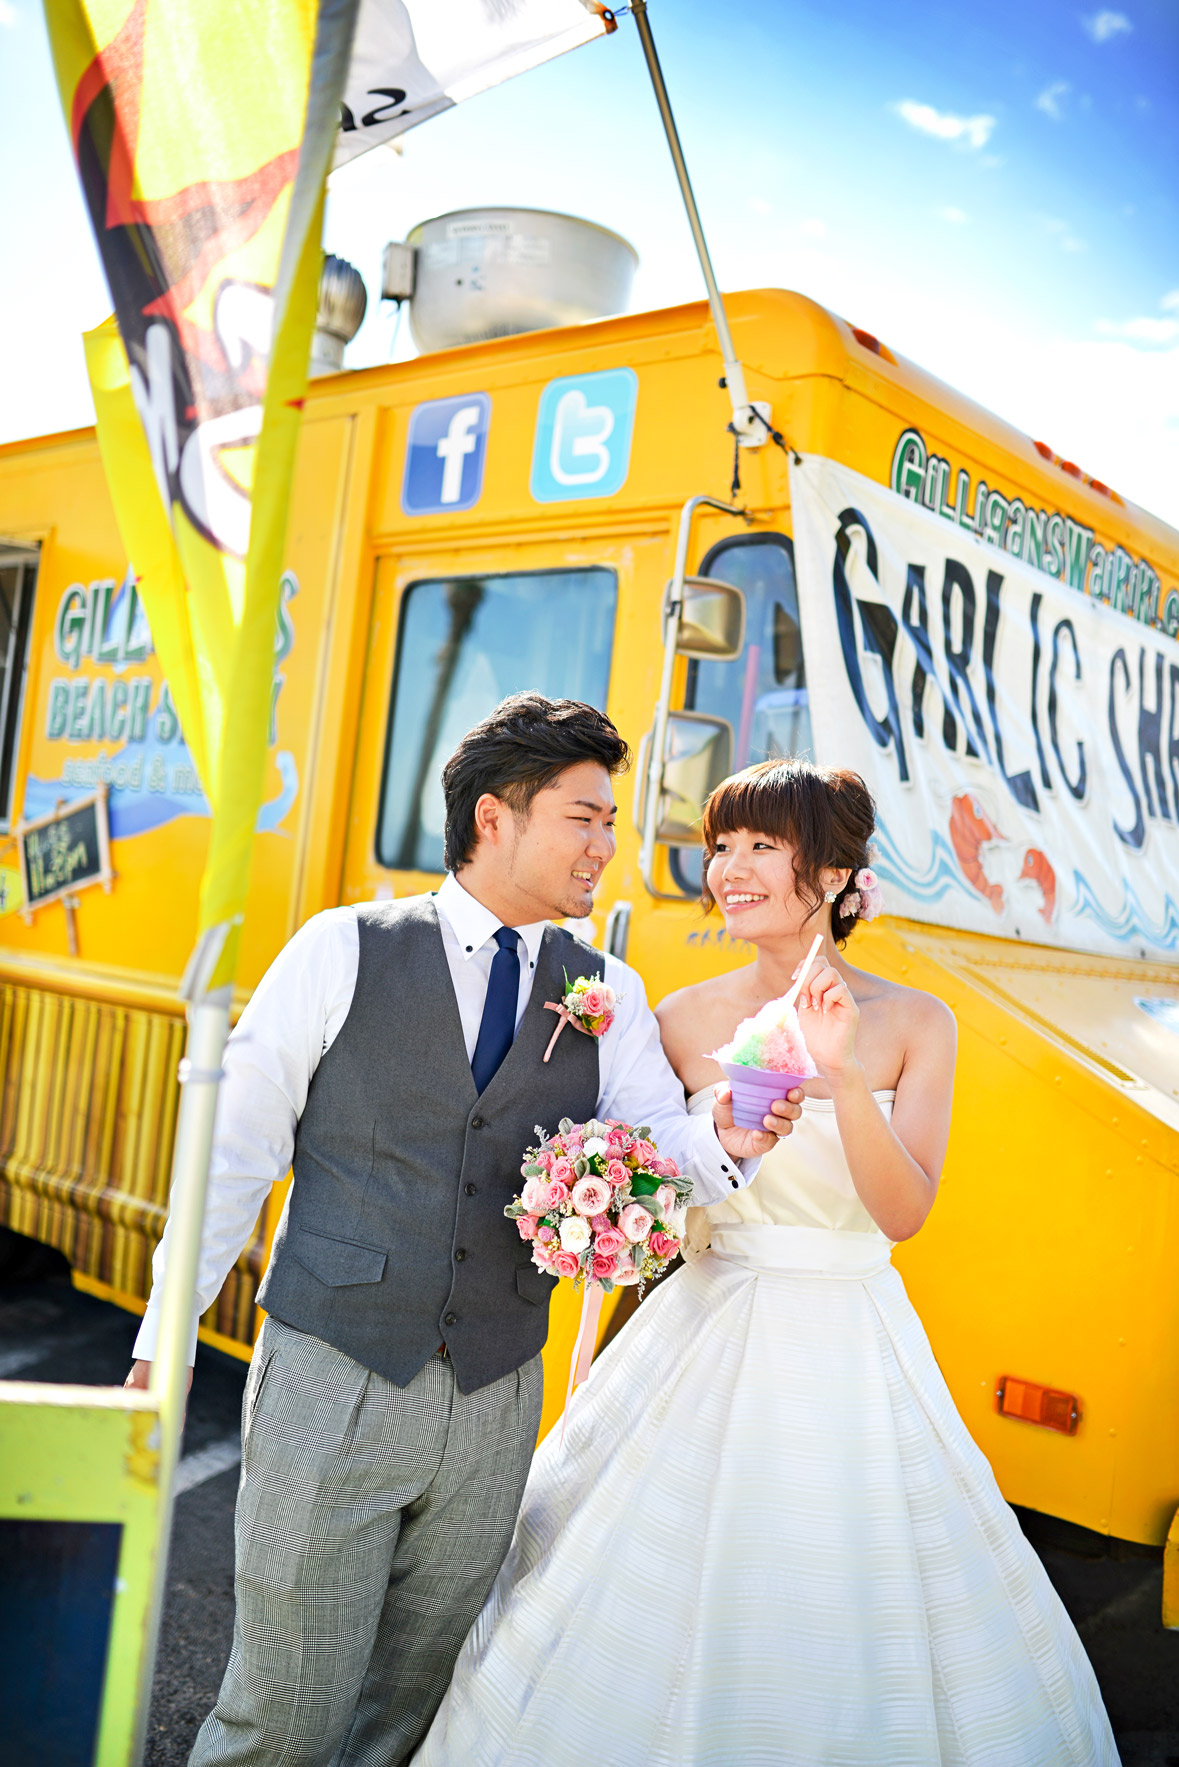 waikiki-beach-wedding-and-downtown-honolulu-hawaii-theater-stephen-ludwig-photography016.jpg